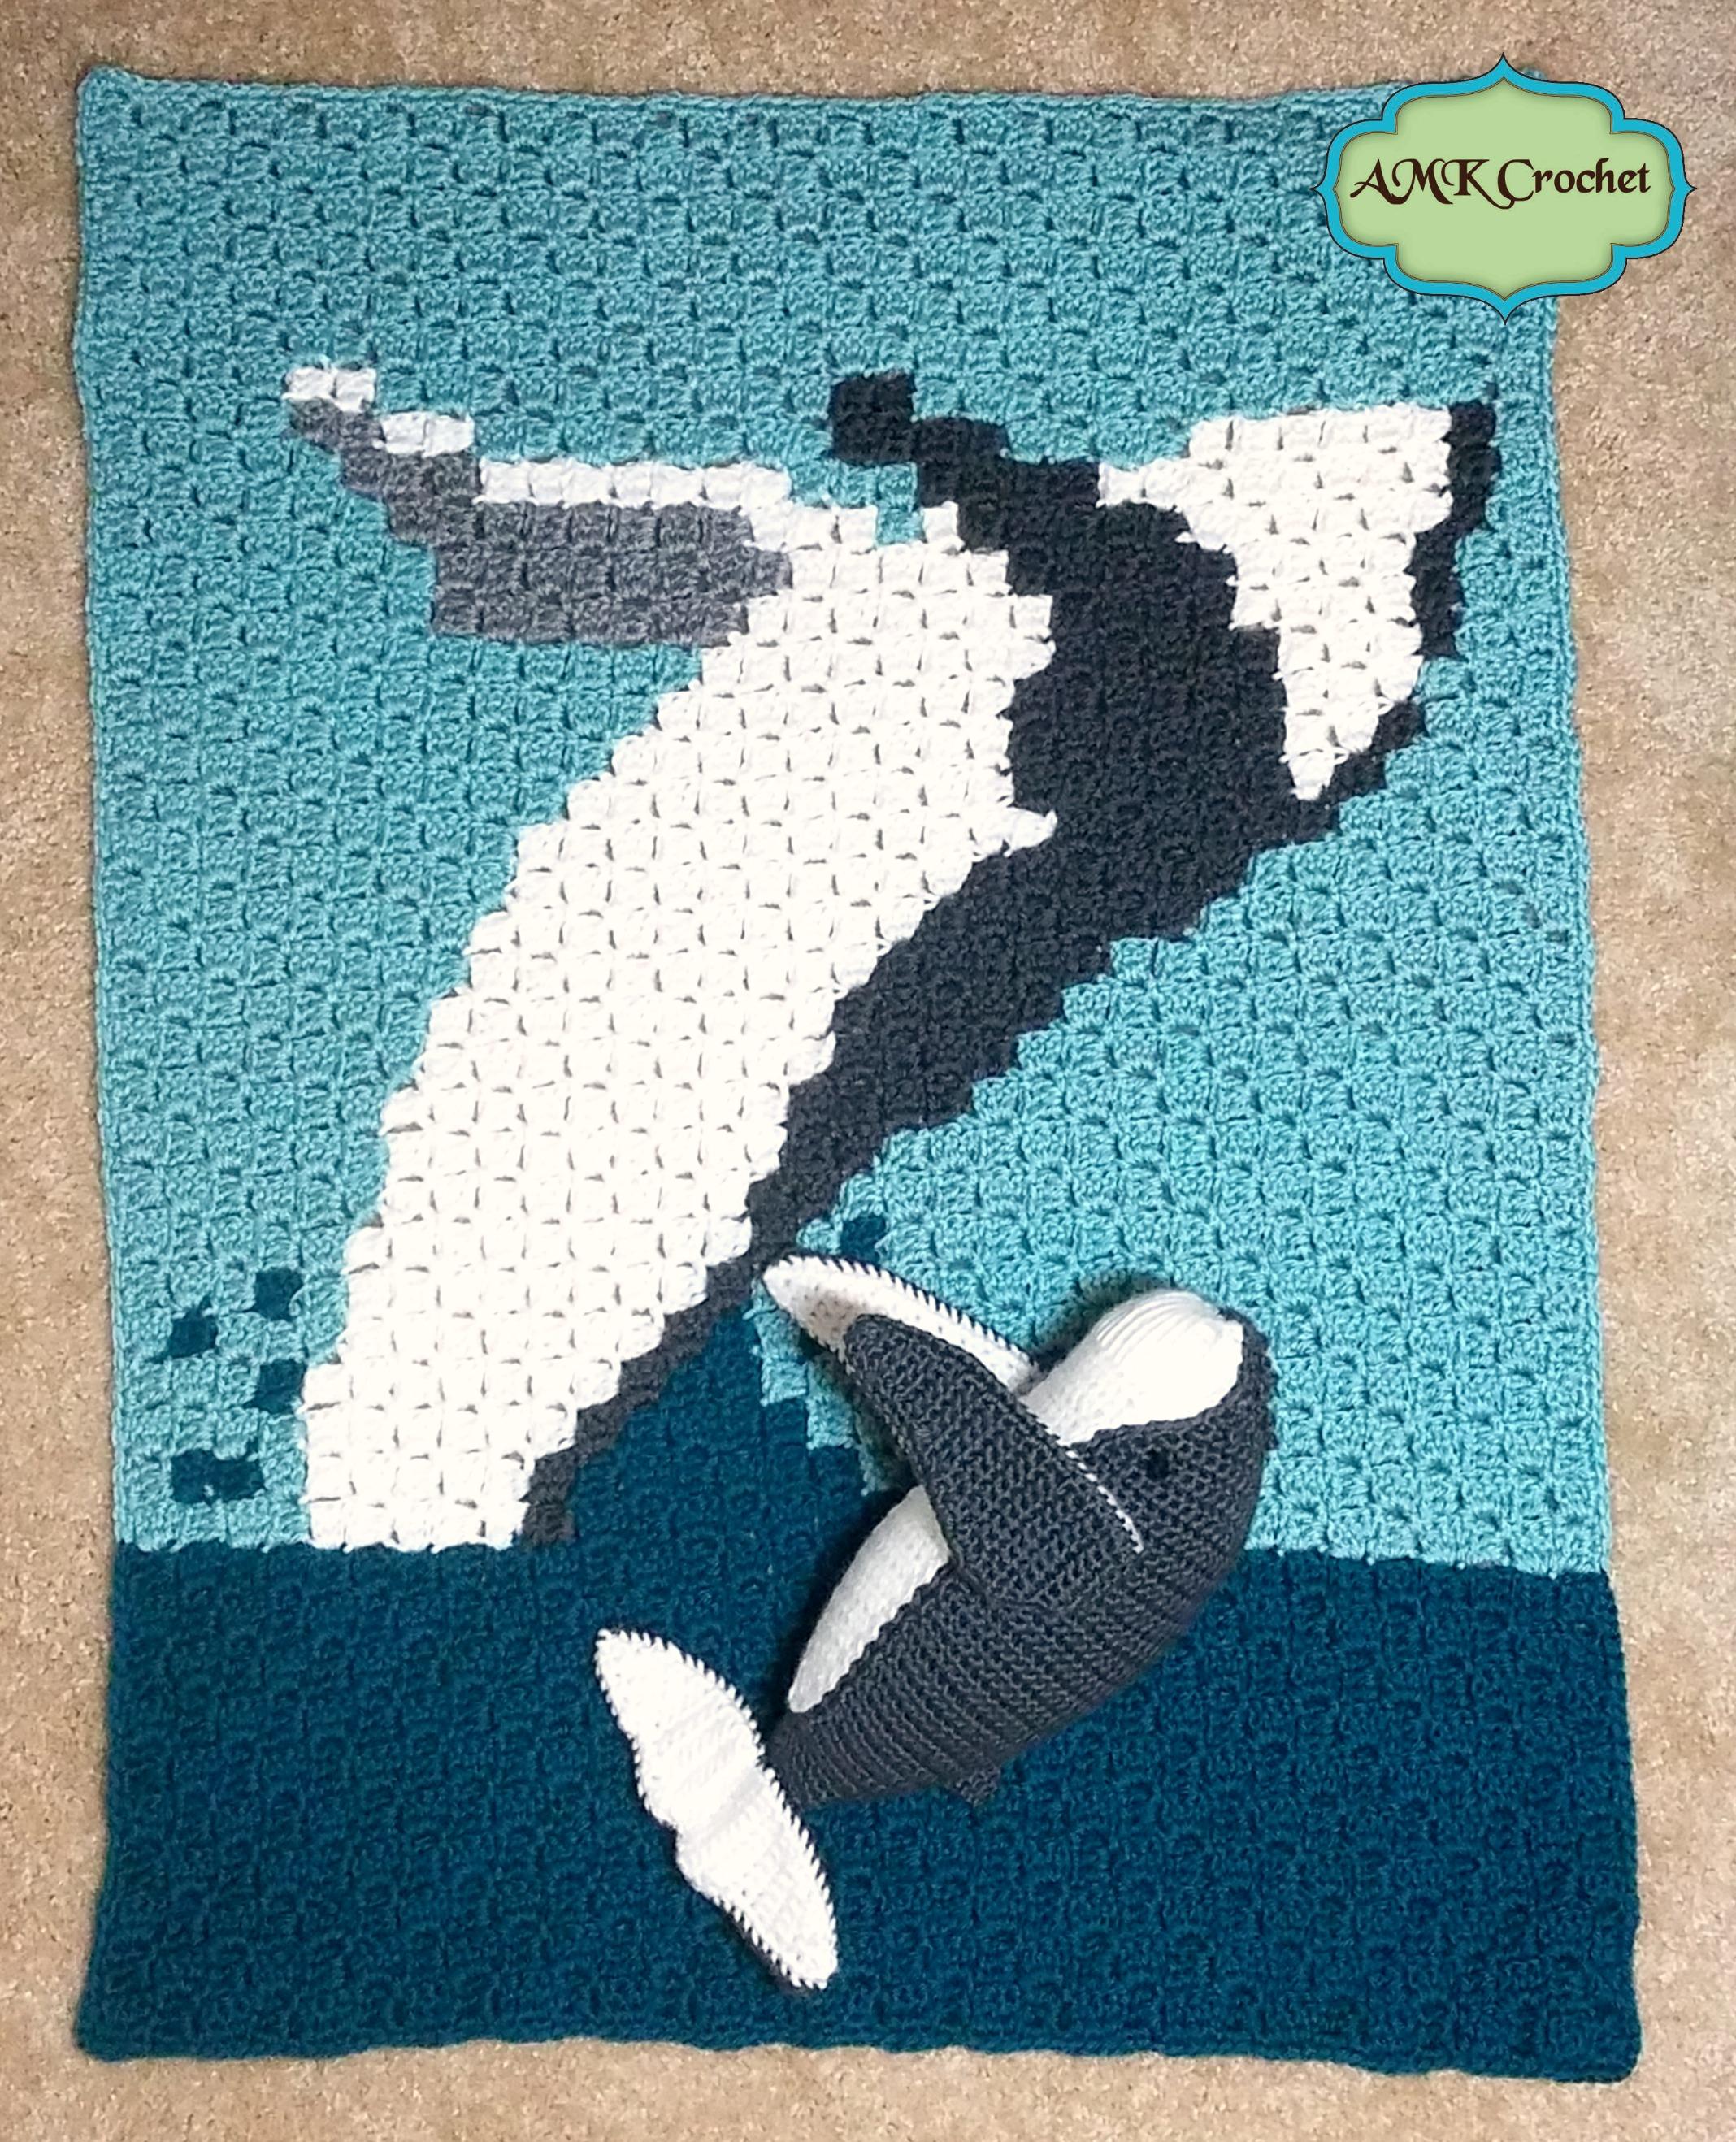 Baby Humpback Crochet Whale Free Pattern - One Dog Woof | 2636x2136